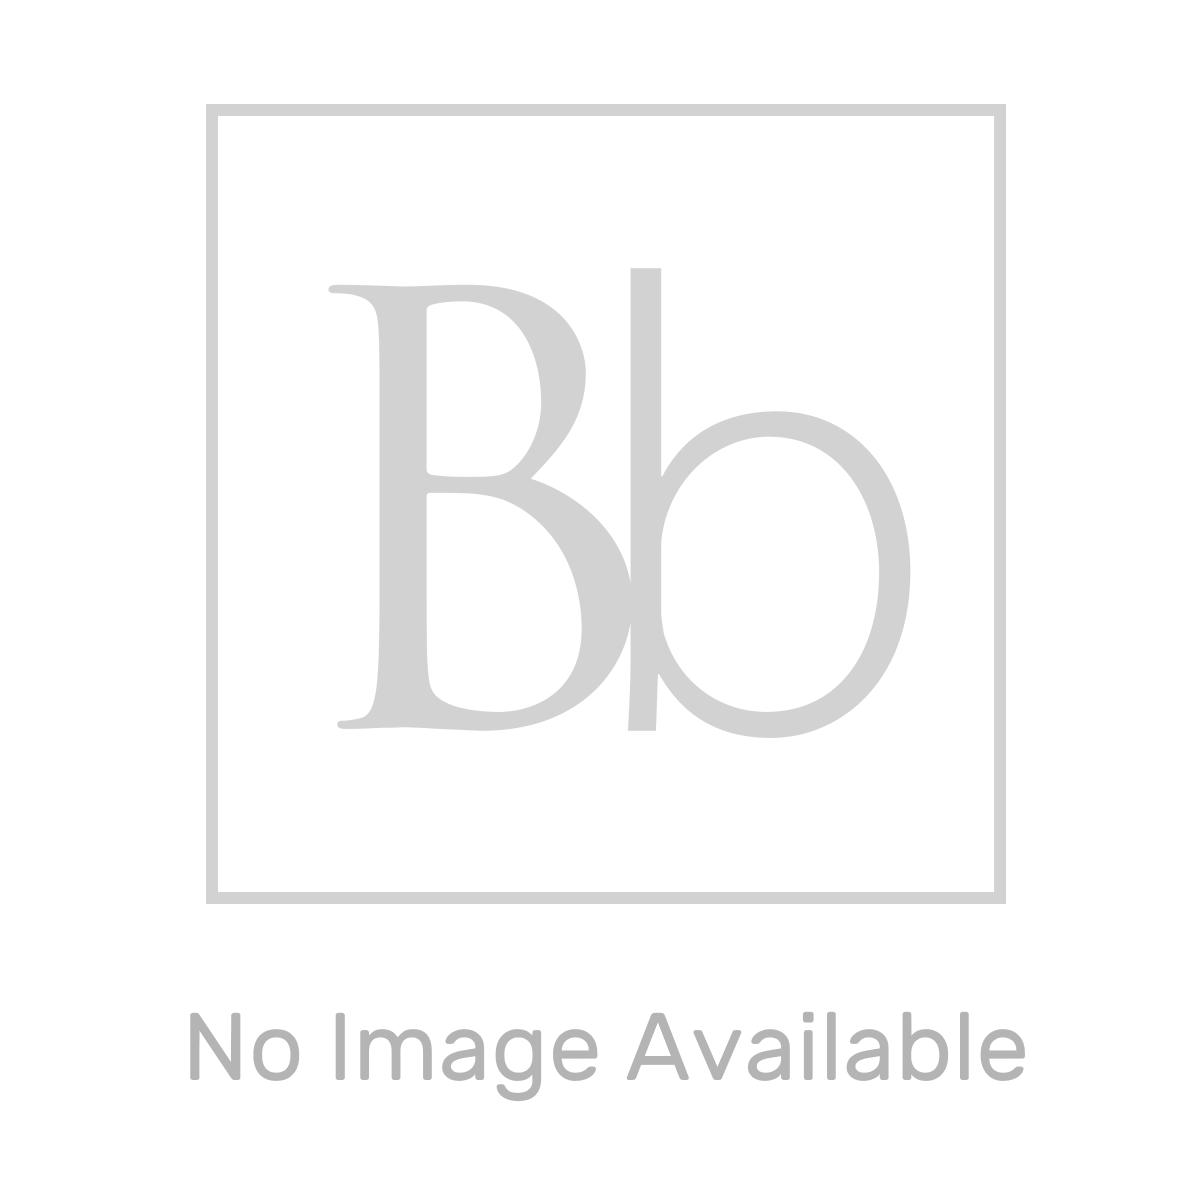 RAK Series 600 Bathroom Suite with Pivot Shower Enclosure Drawing